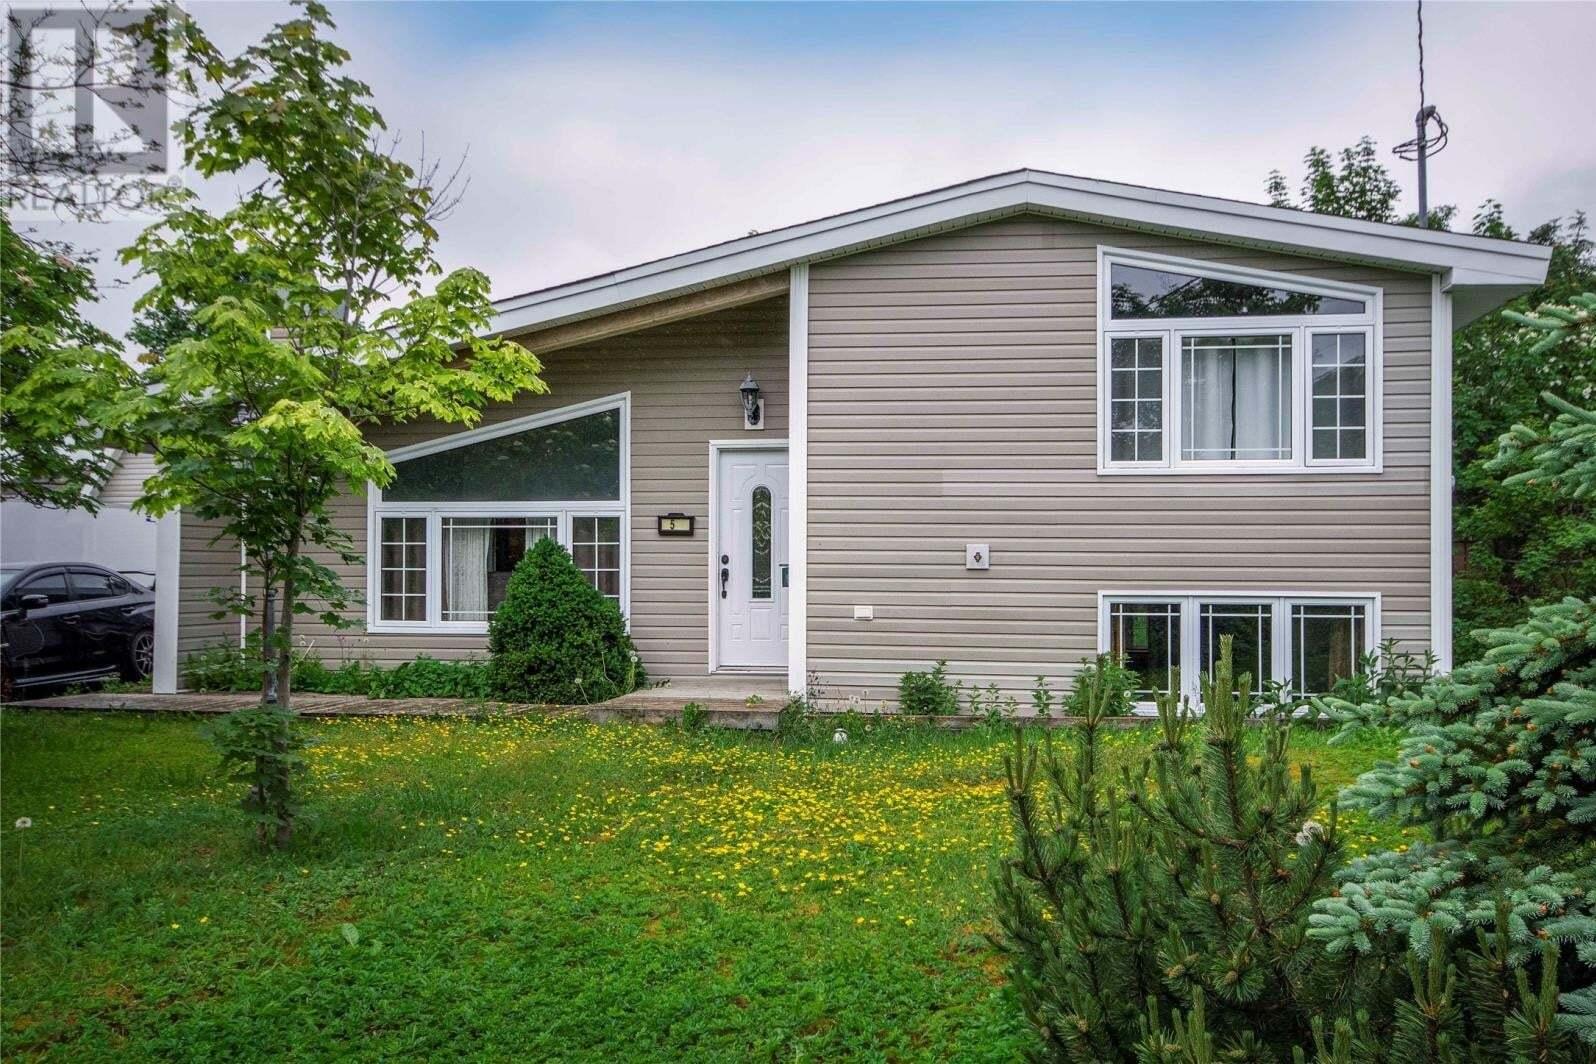 House for sale at 5 Edinburgh Dr Mount Pearl Newfoundland - MLS: 1216893